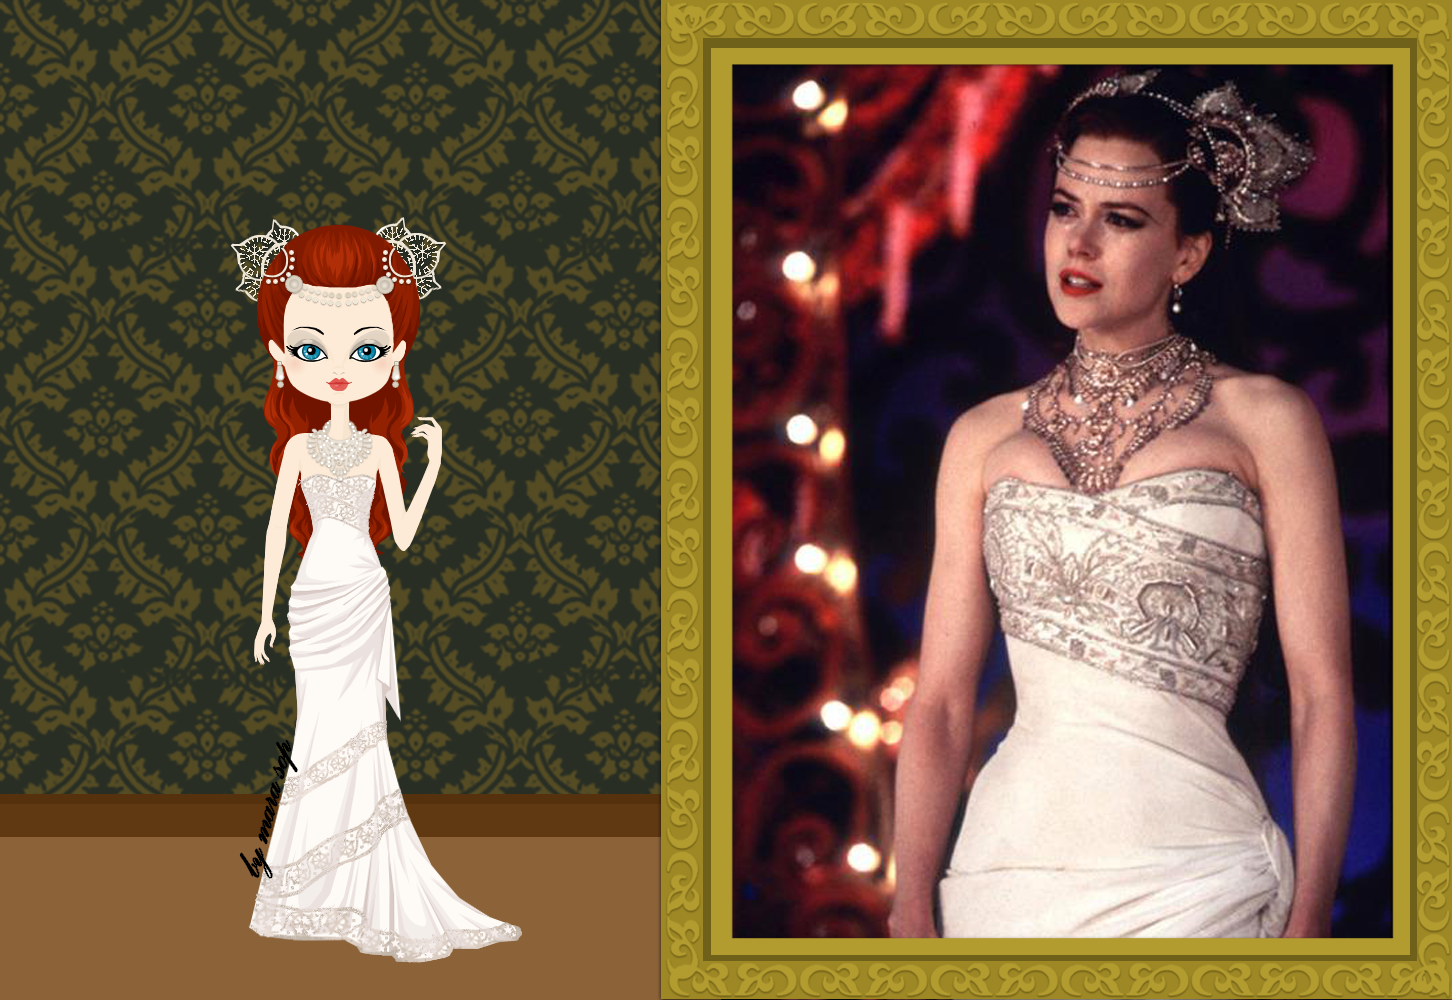 Satine (Nicole Kidman) In Her Hindi Wedding Dress, From Moulin Rouge. C.  1899